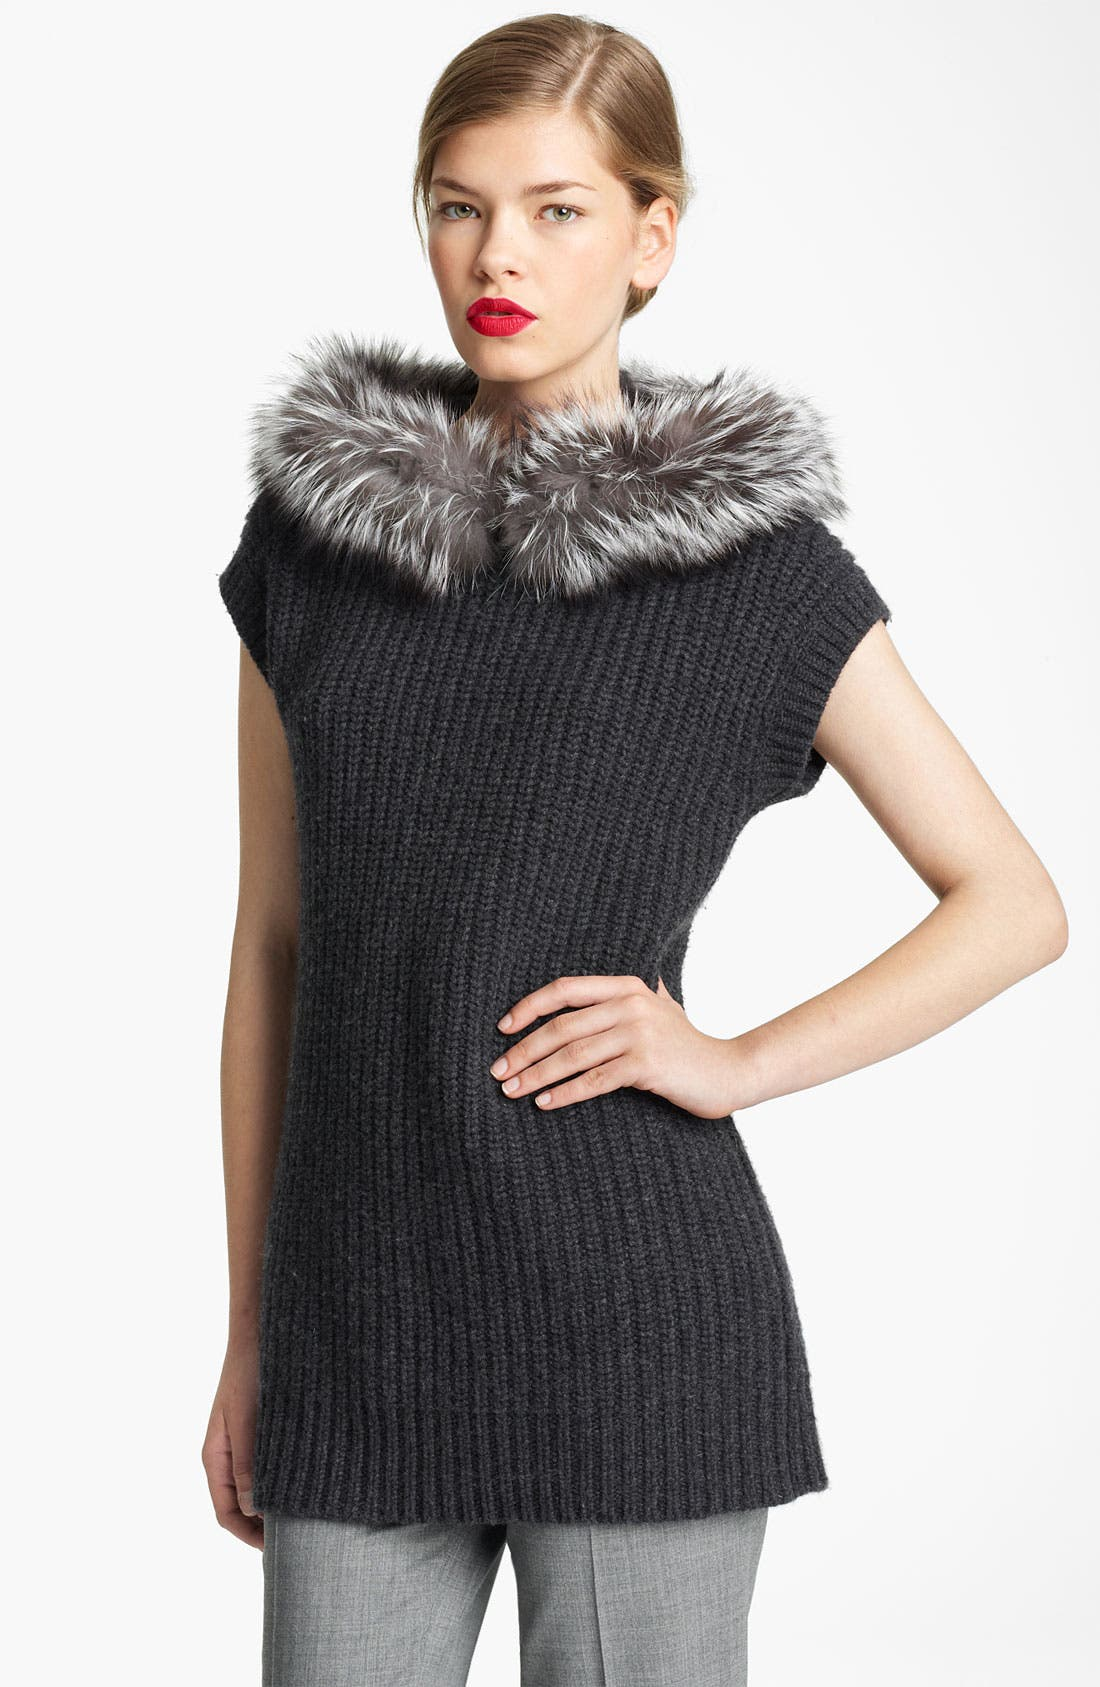 Alternate Image 1 Selected - Michael Kors Genuine Fox Fur Trim Hooded Sweater